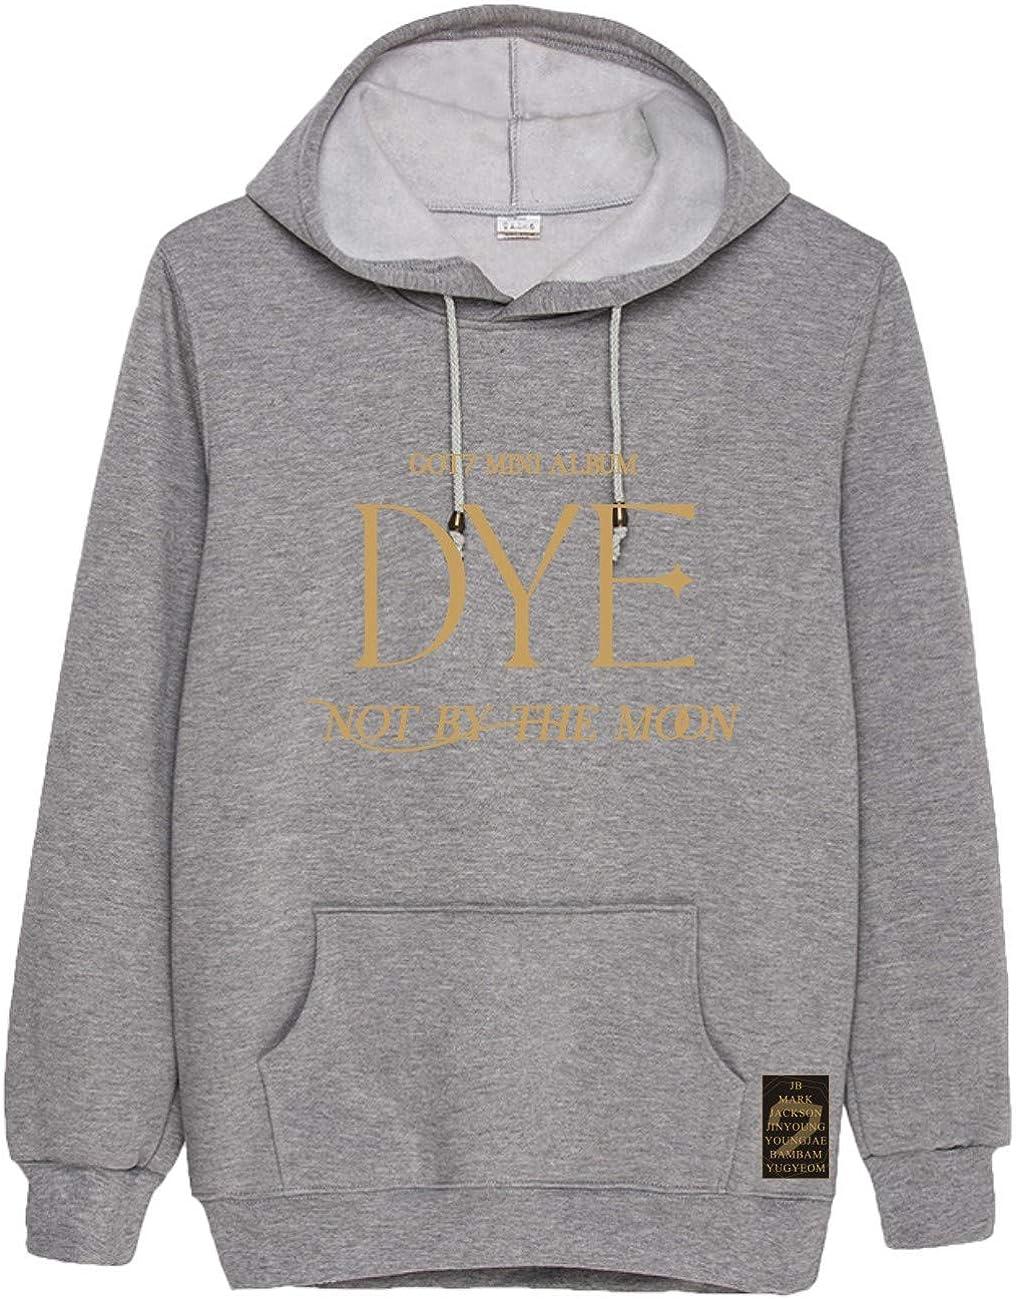 Got7 Hoodie Jackson Mark JB Bambam New Album DYE Sweatshirt Sweater KPOP Got7 Merchandise